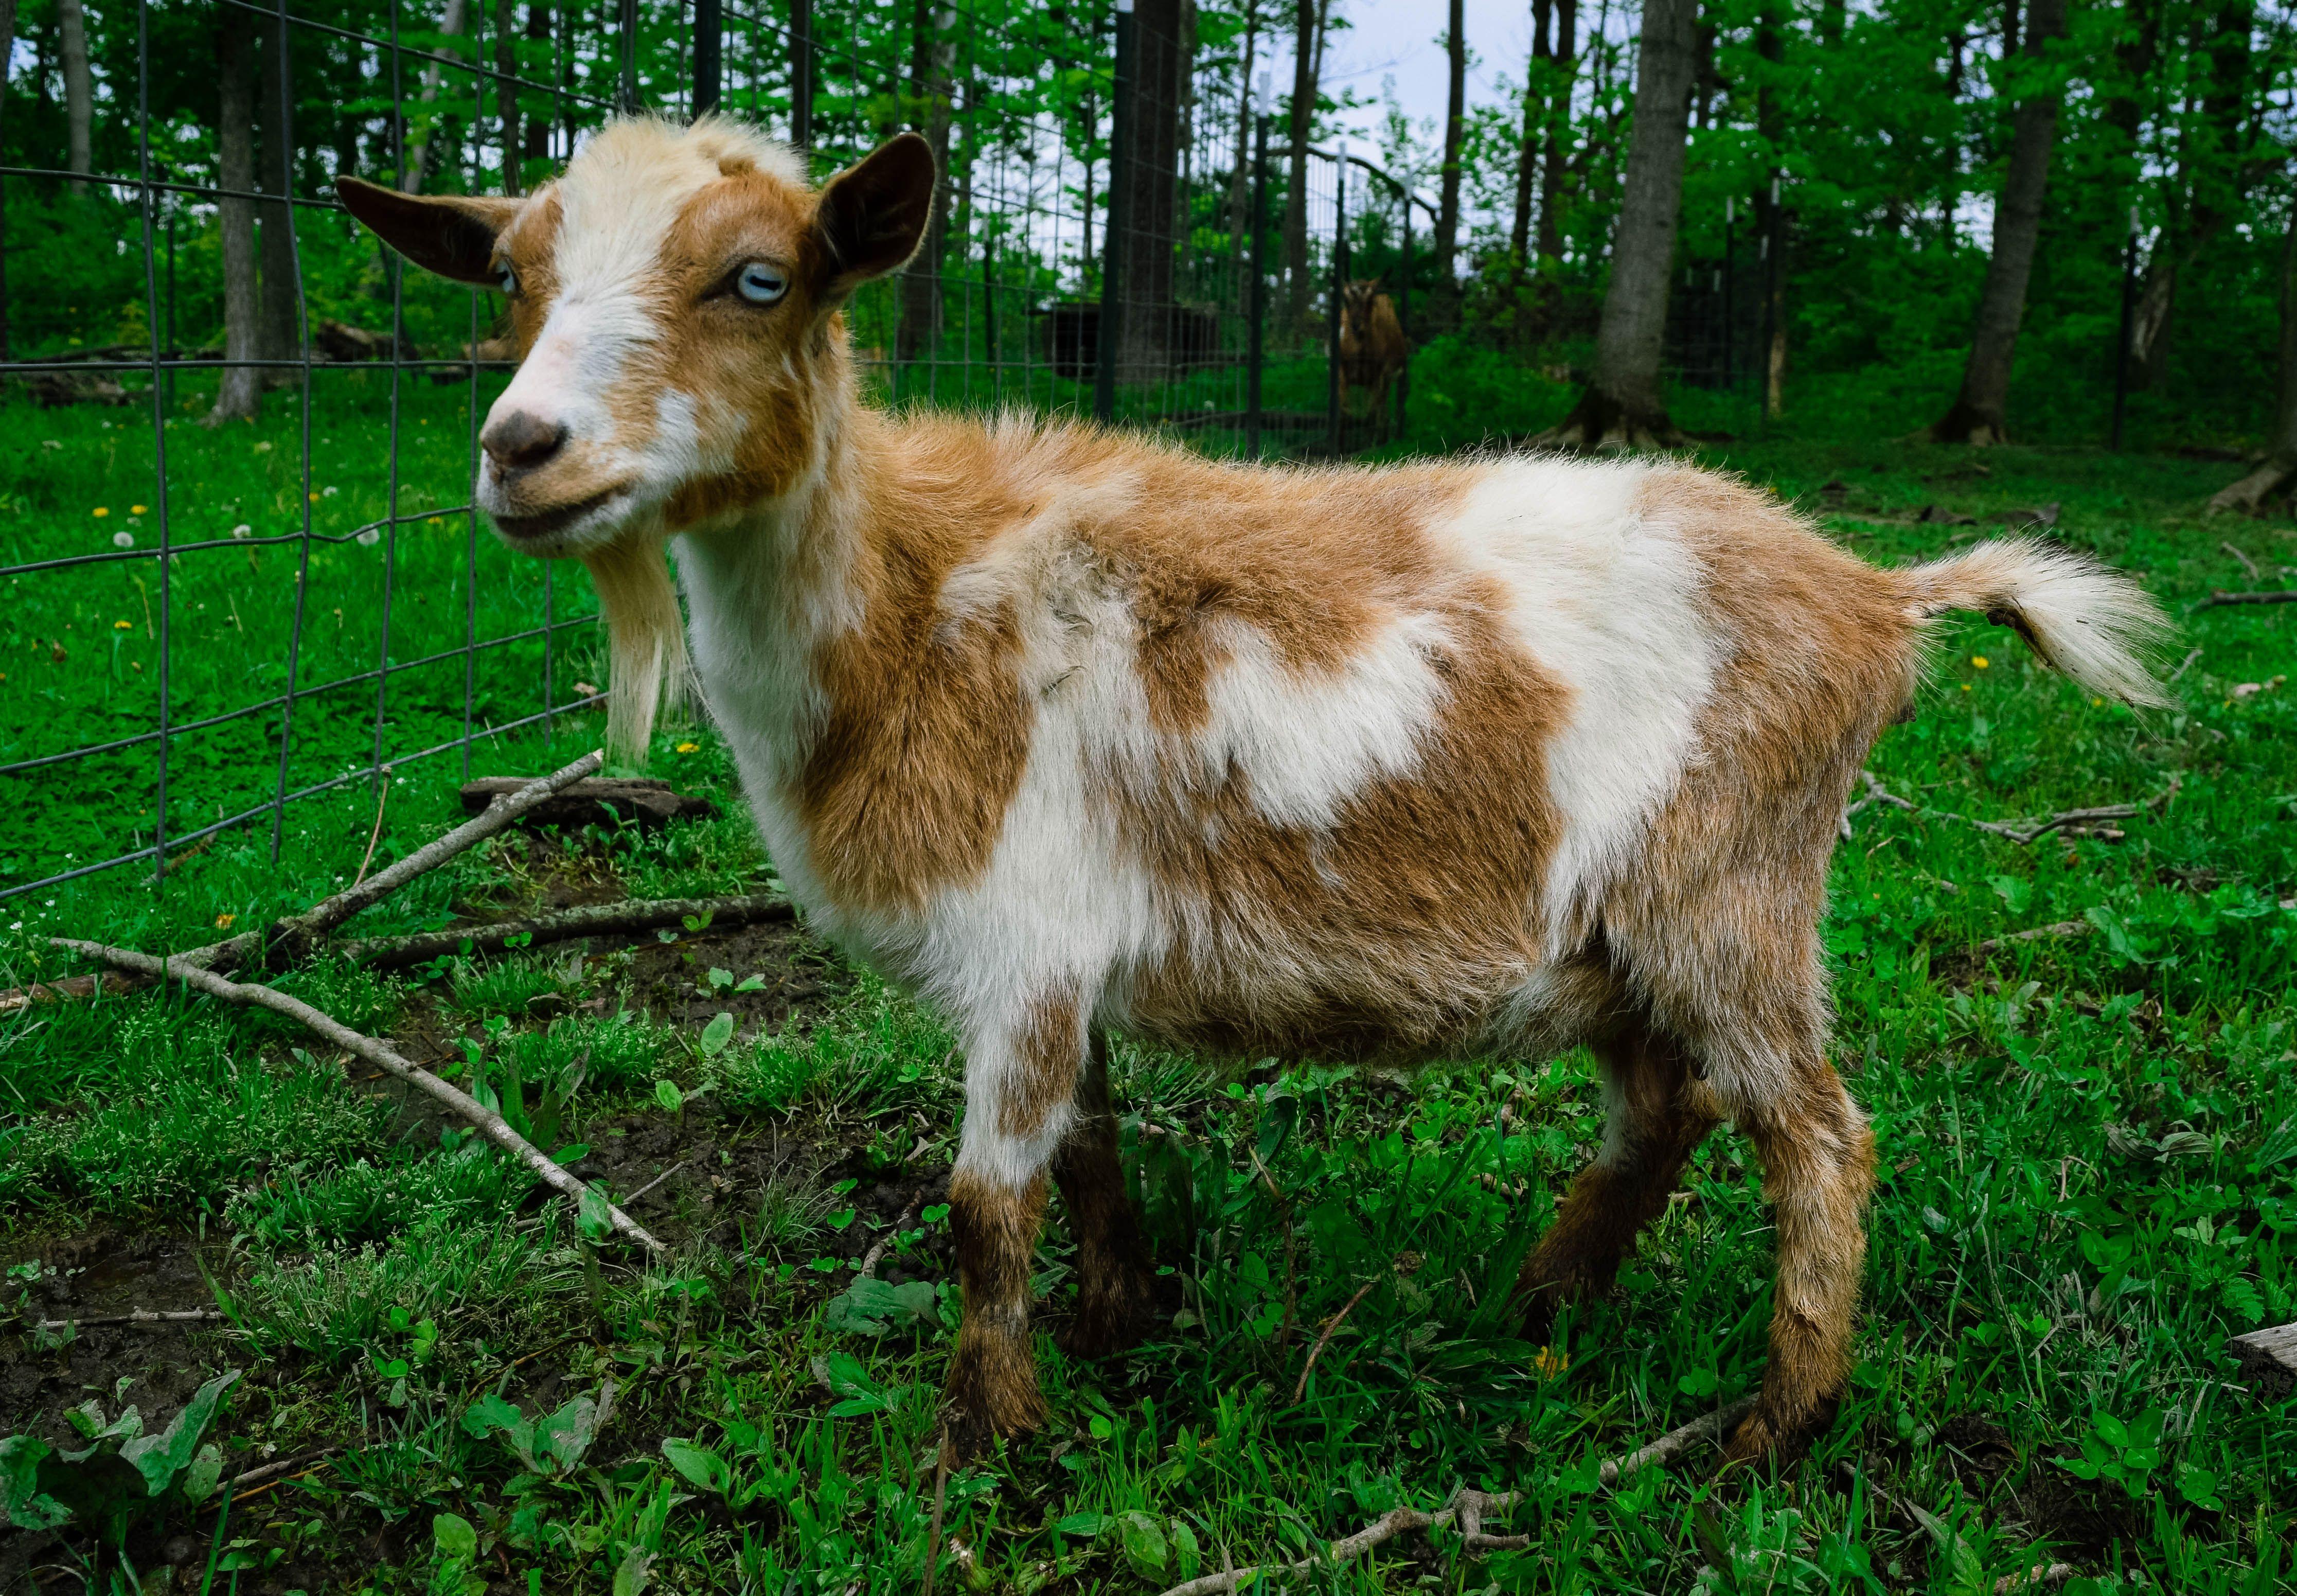 Cowgirl A Mini Alpine Doe Goat With Blue Eyes